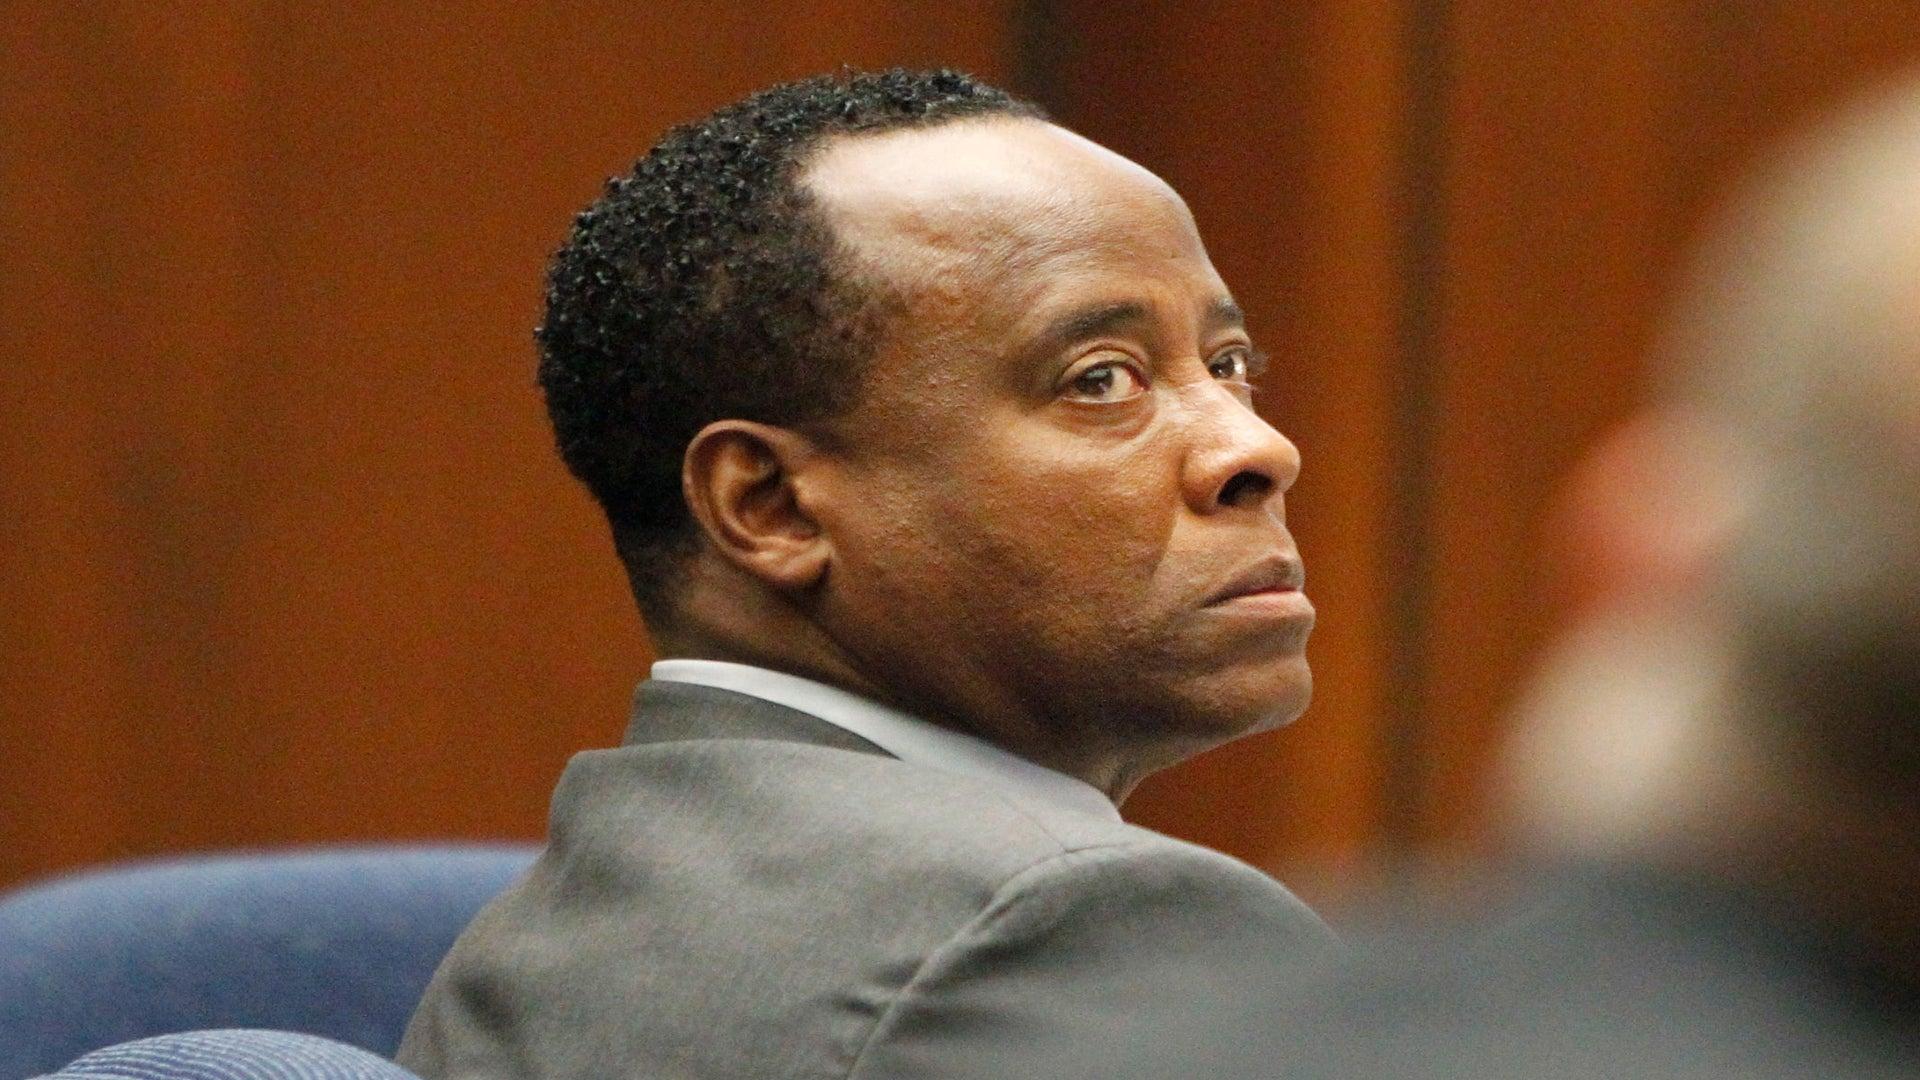 Dr. Conrad Murray Cries During Trial